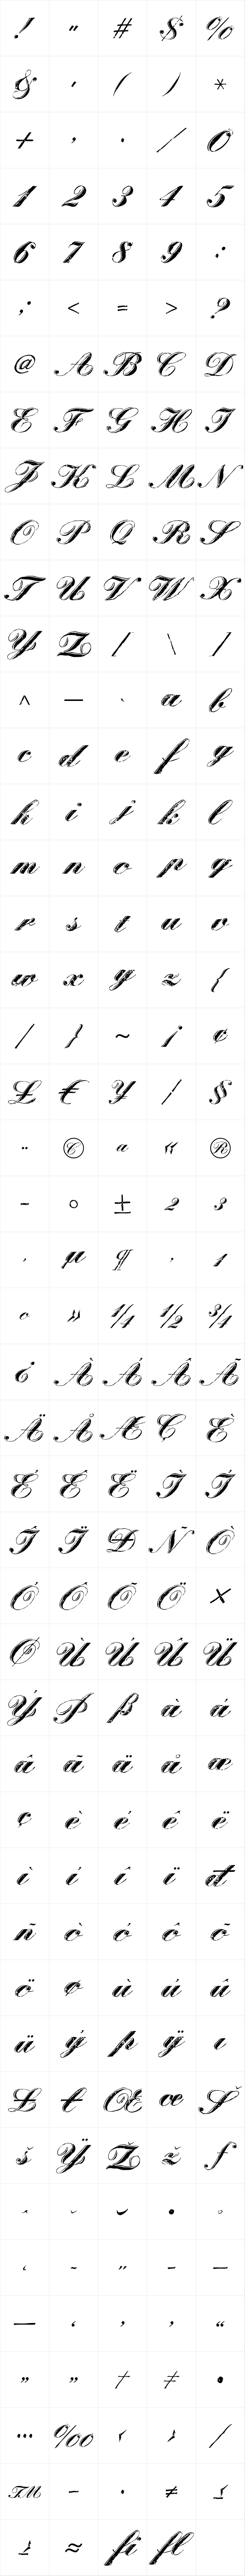 Scriptage One